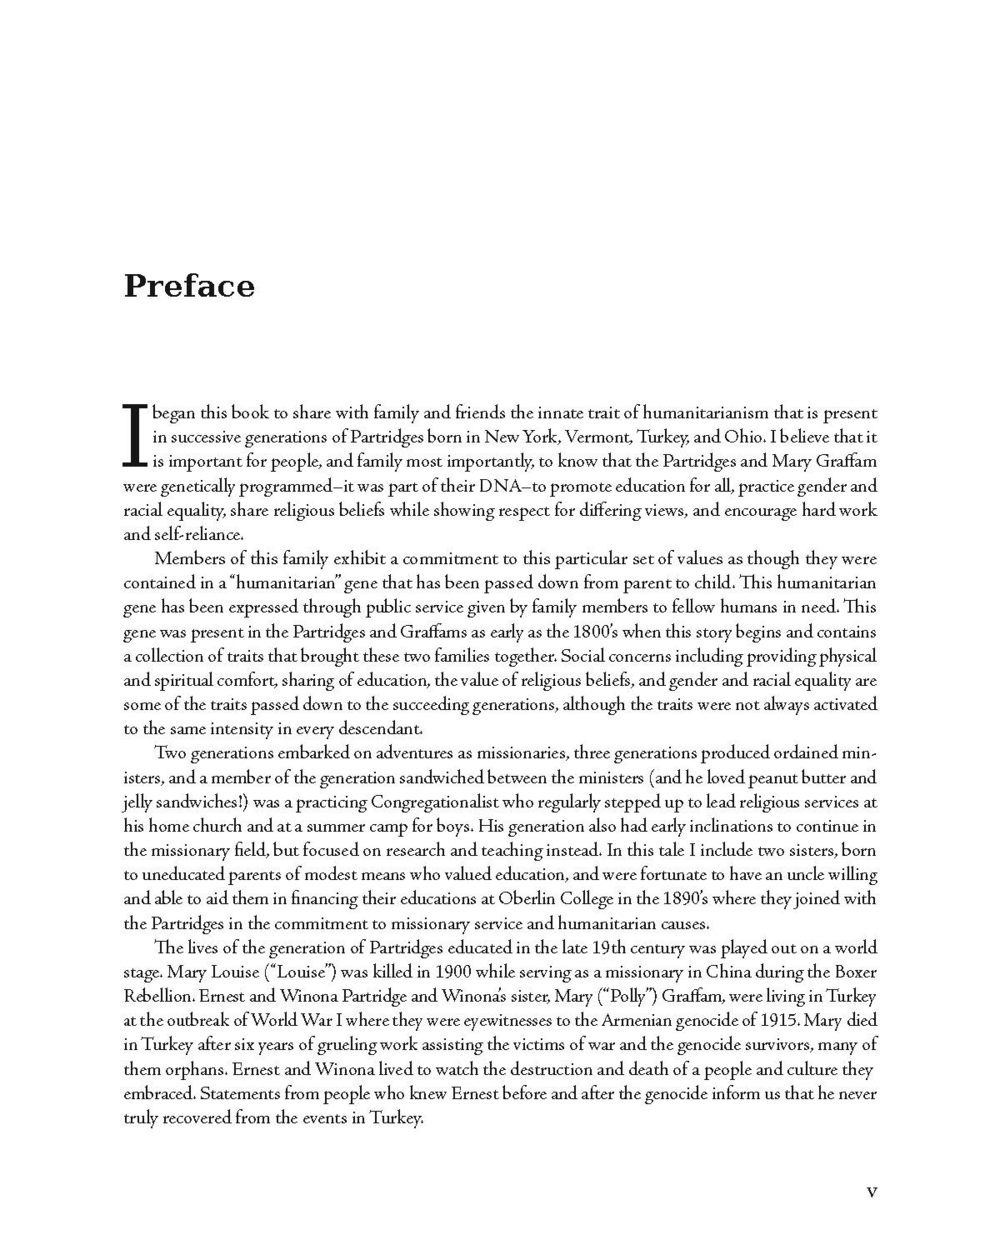 binder3_page_06.jpg